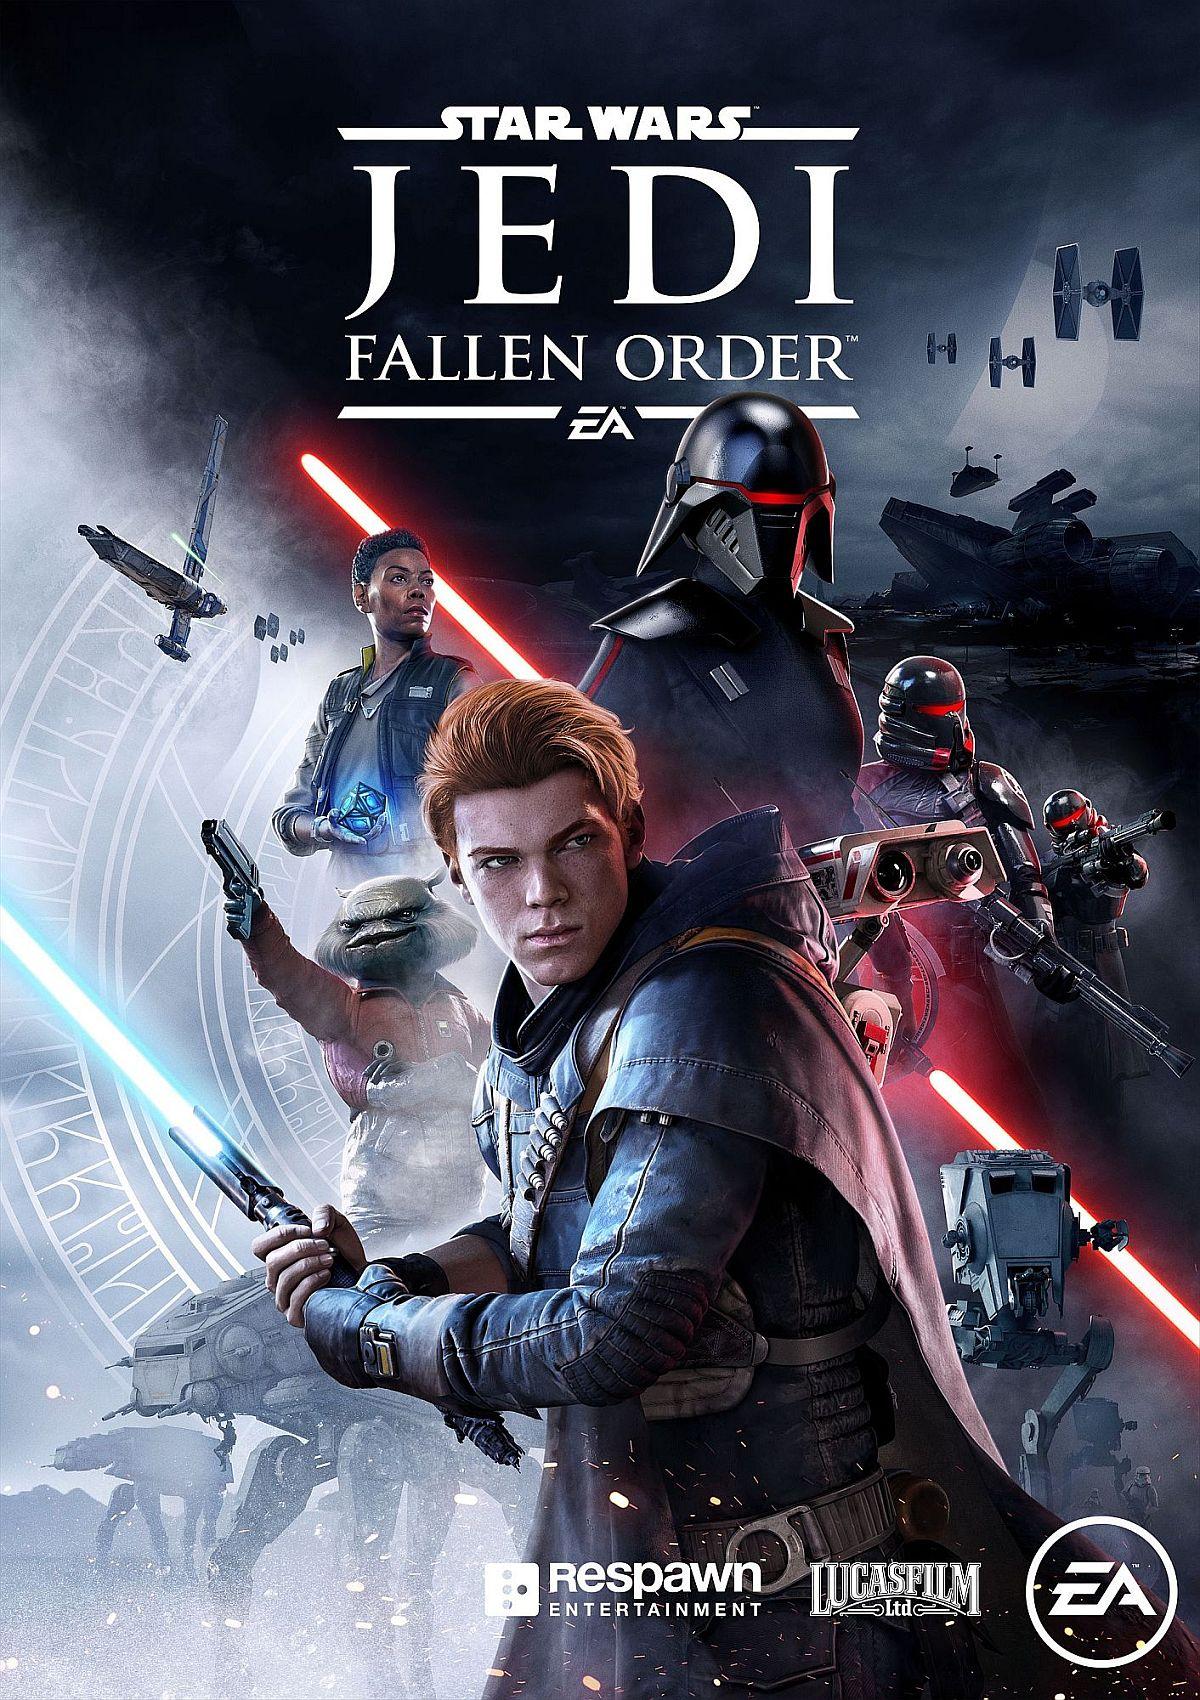 دانلود زیرنویس فارسی فیلم Star Wars Jedi: Fallen Order